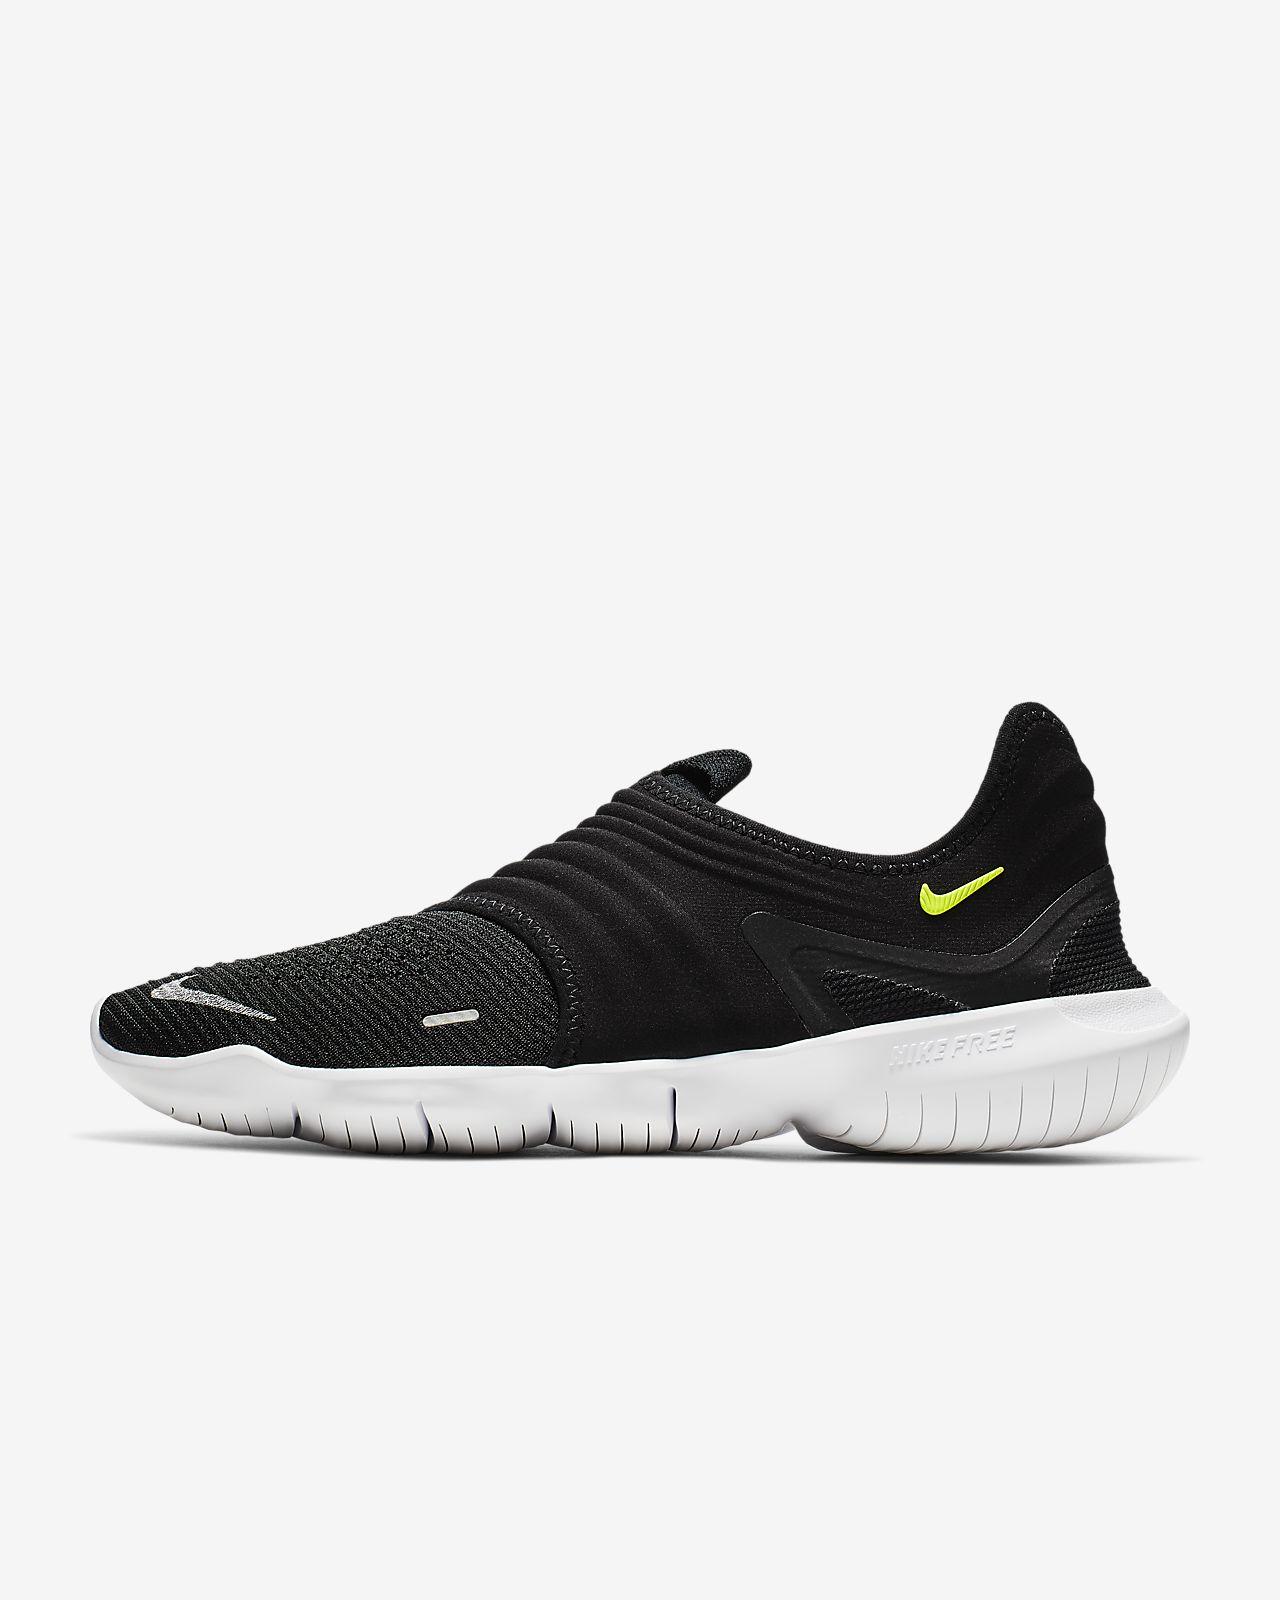 1ae683bc Męskie buty do biegania Nike Free RN Flyknit 3.0. Nike.com PL